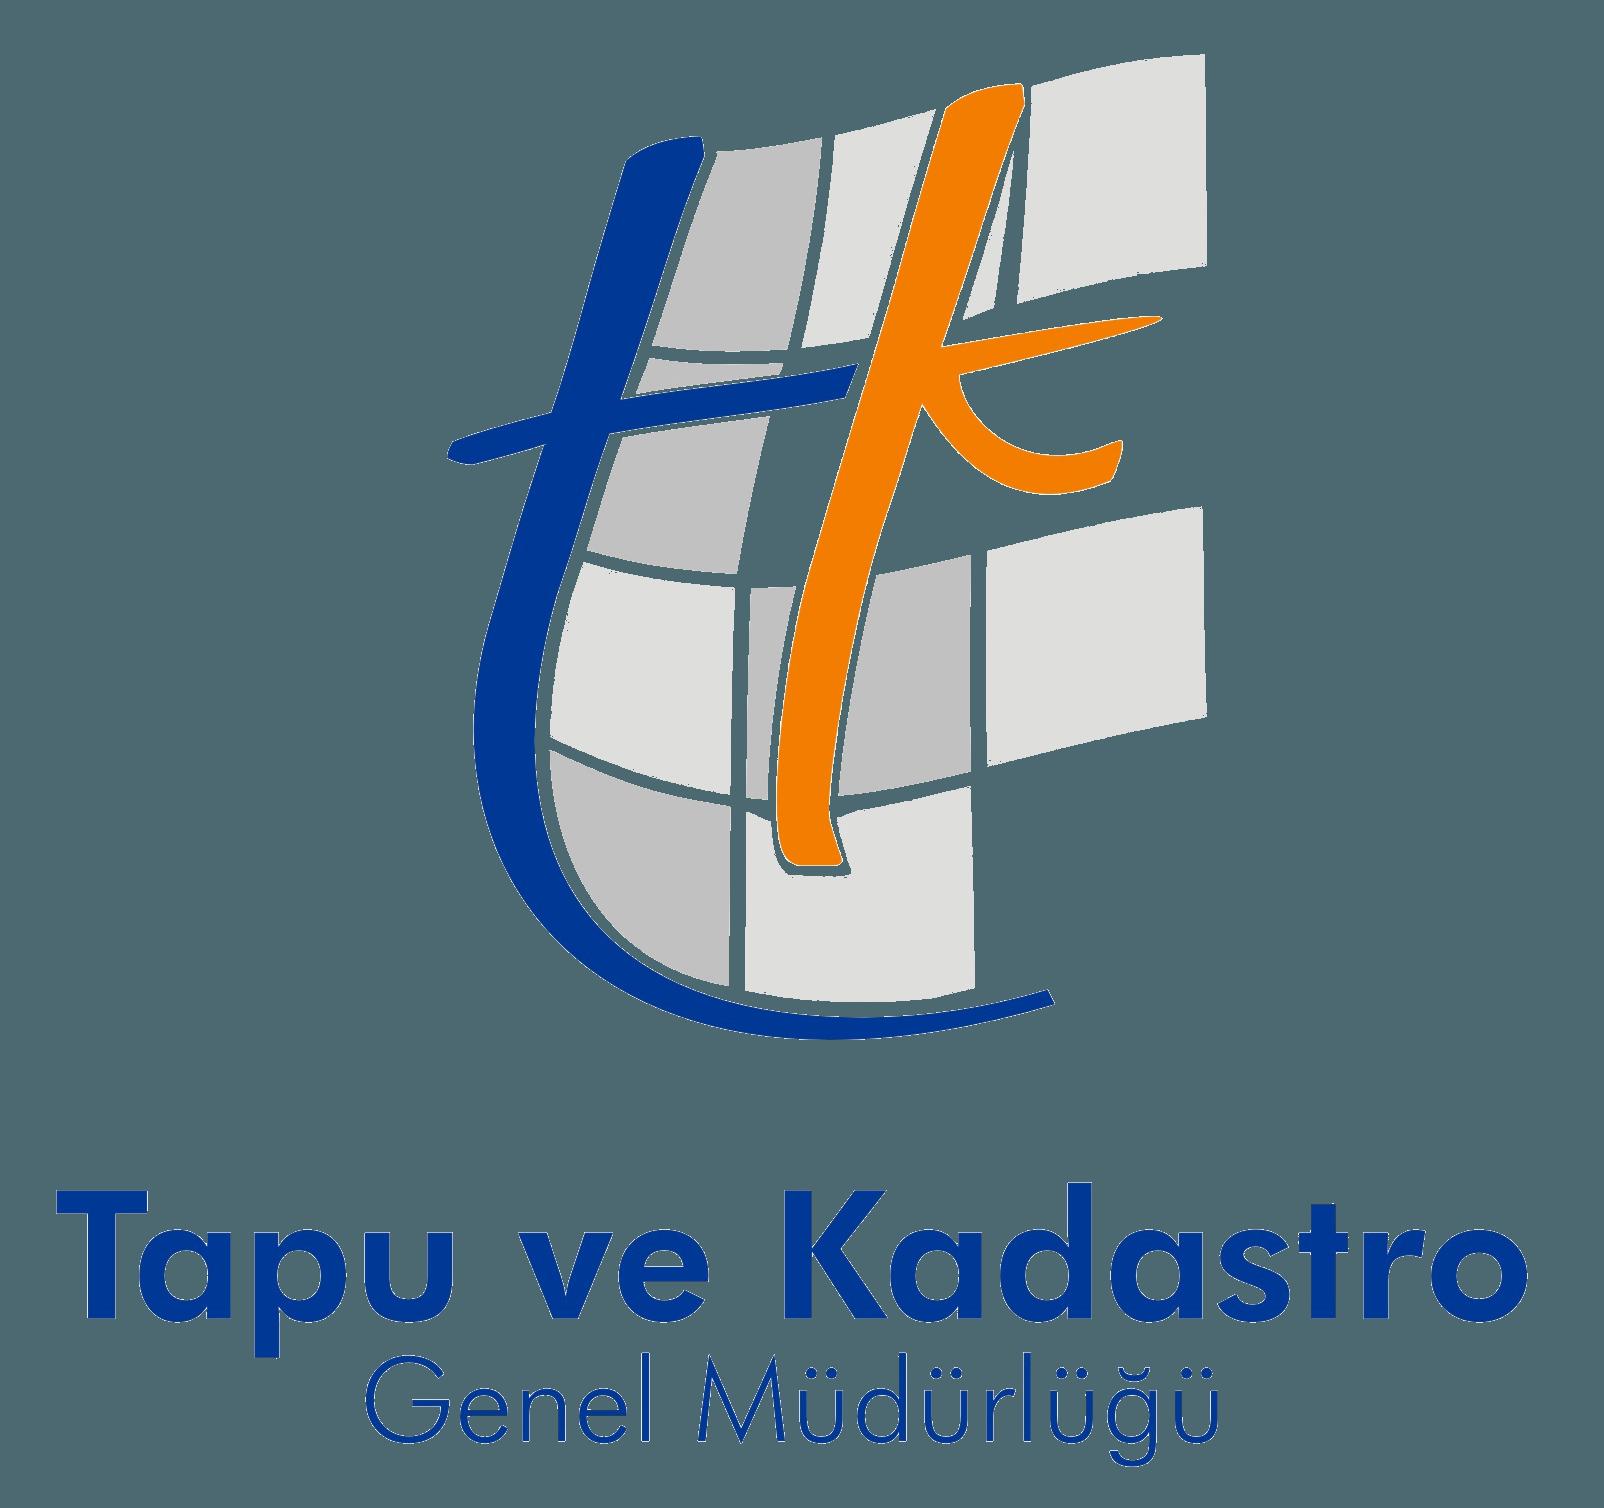 TKM   Tapu ve Kadastro Genel Müdürlüğü Logosu [tkgm.gov.tr] png